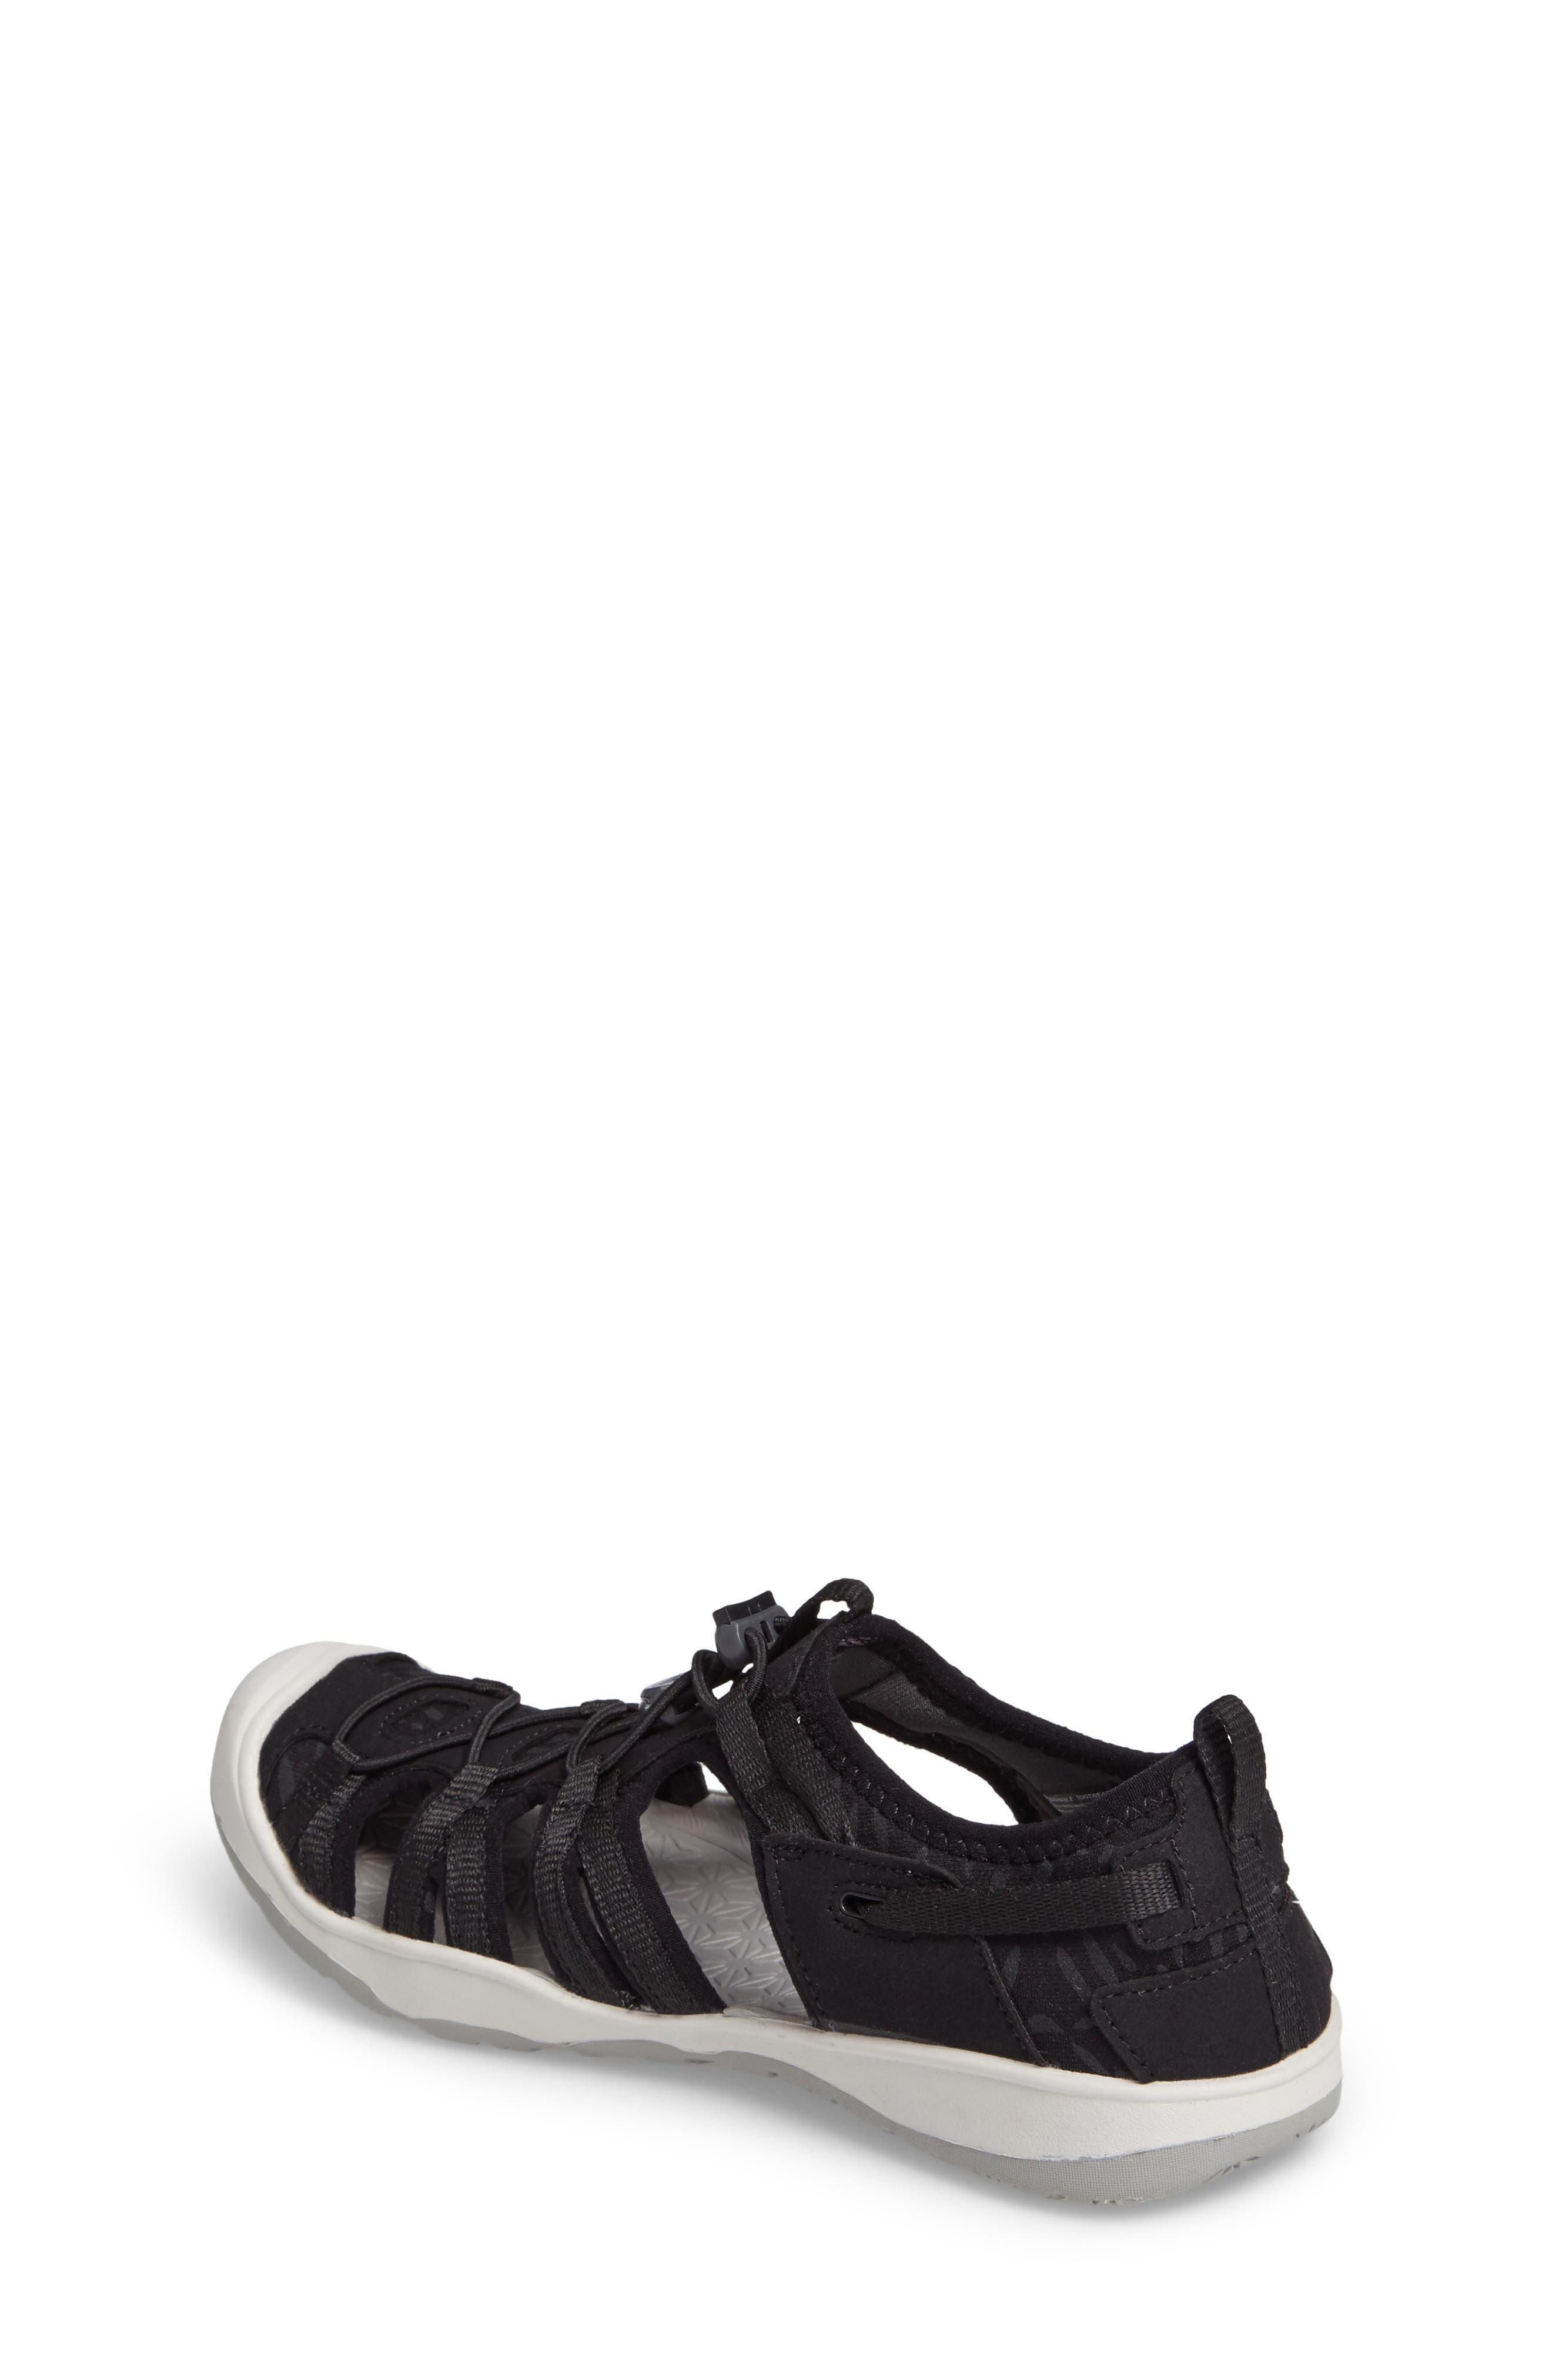 KEEN, Moxie Water Friendly Sandal, Alternate thumbnail 2, color, BLACK/ VAPOR